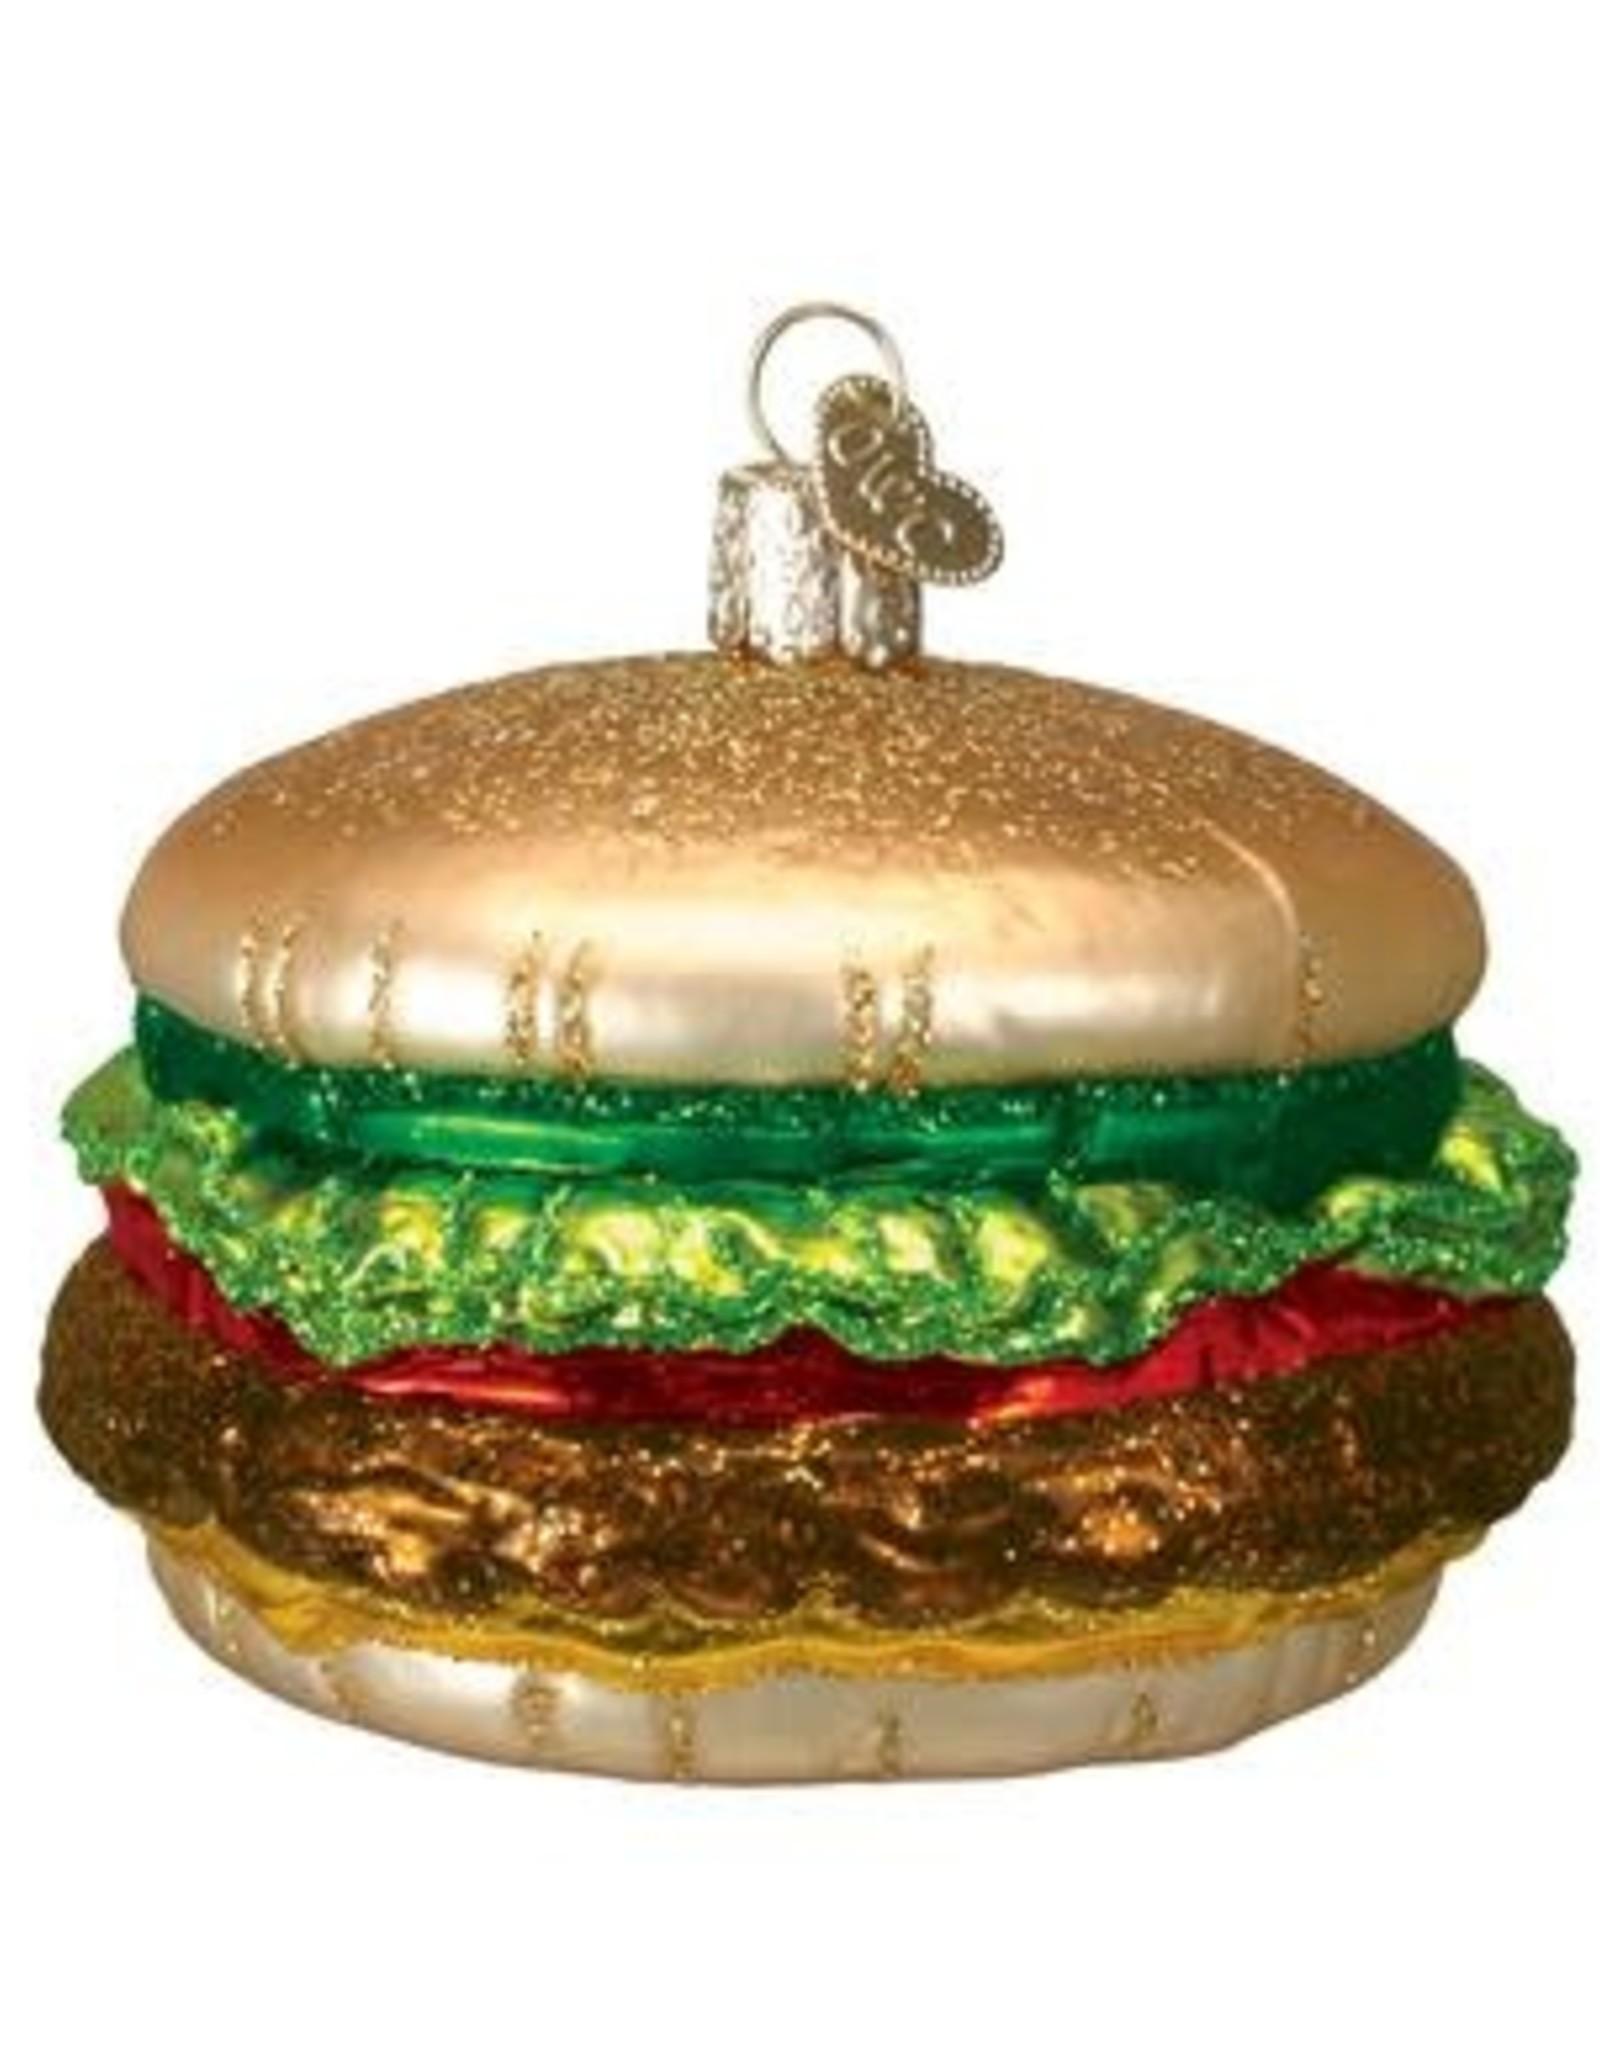 Old World Christmas Old World Christmas | Cheeseburger Ornament